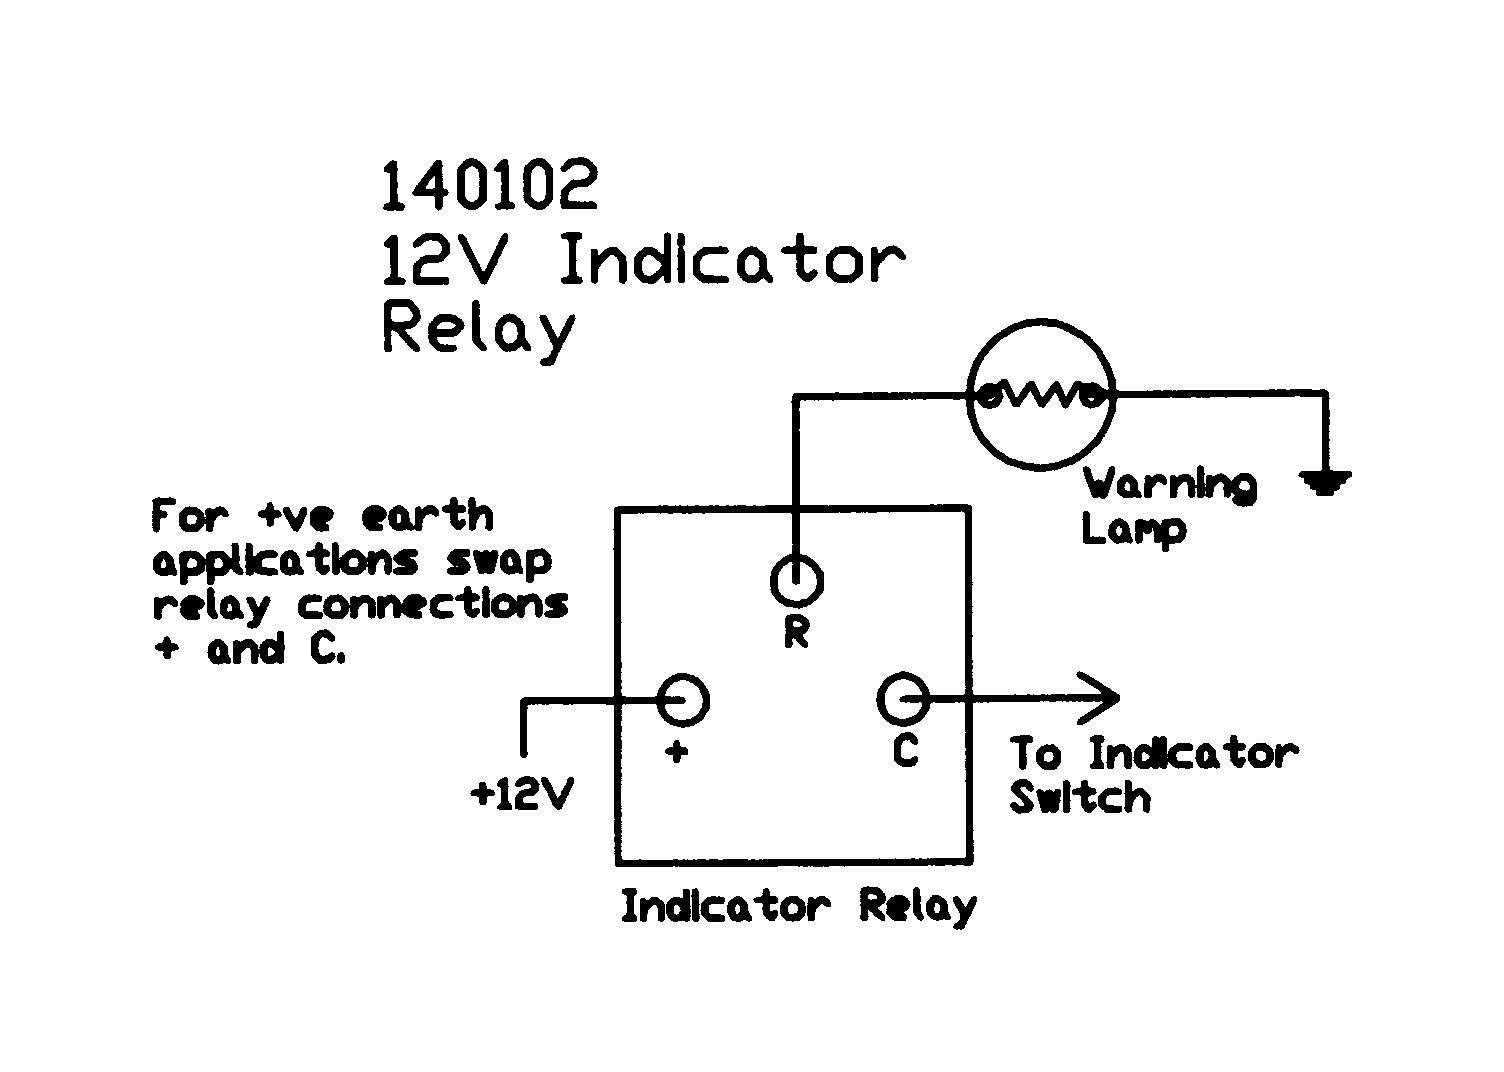 Three Prong Flasher Wiring Diagram | Wiring Diagram - 3 Pin Flasher Relay Wiring Diagram